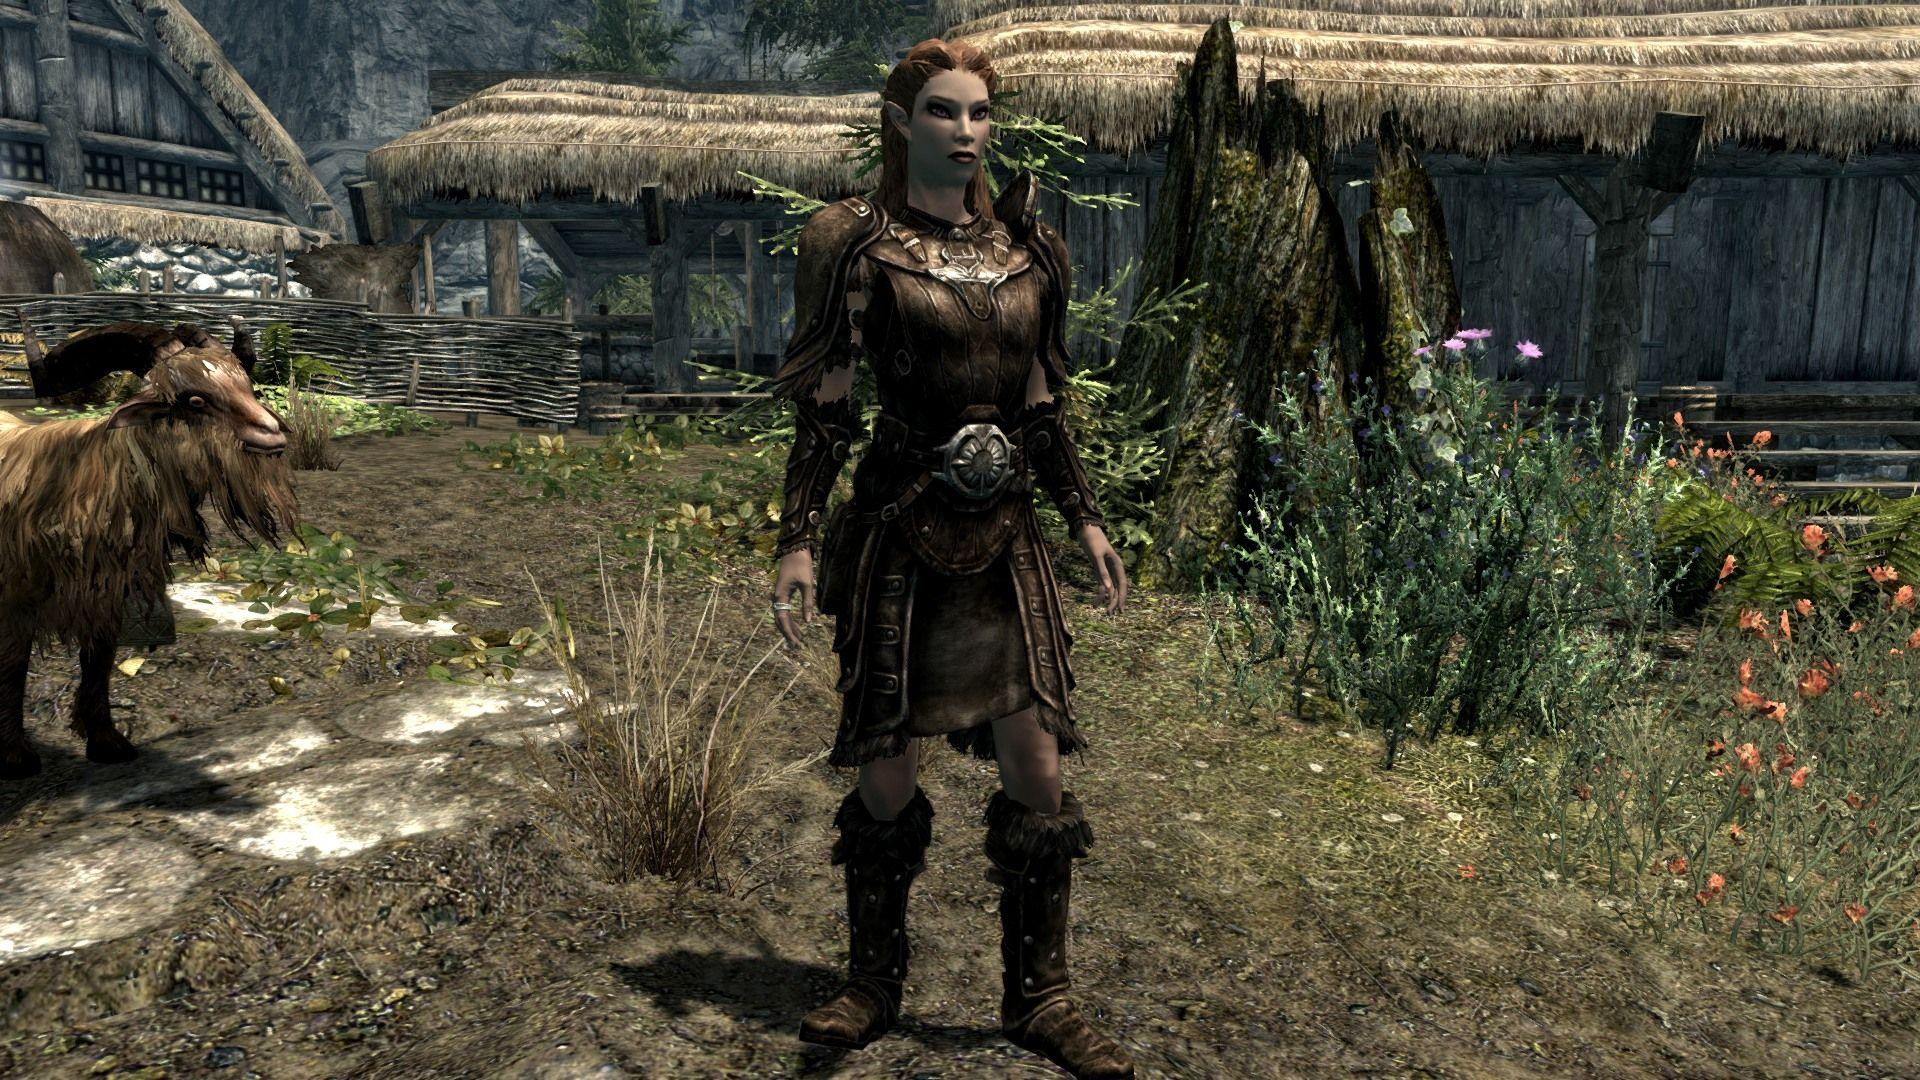 Good Skyrim Female Armors - Year of Clean Water